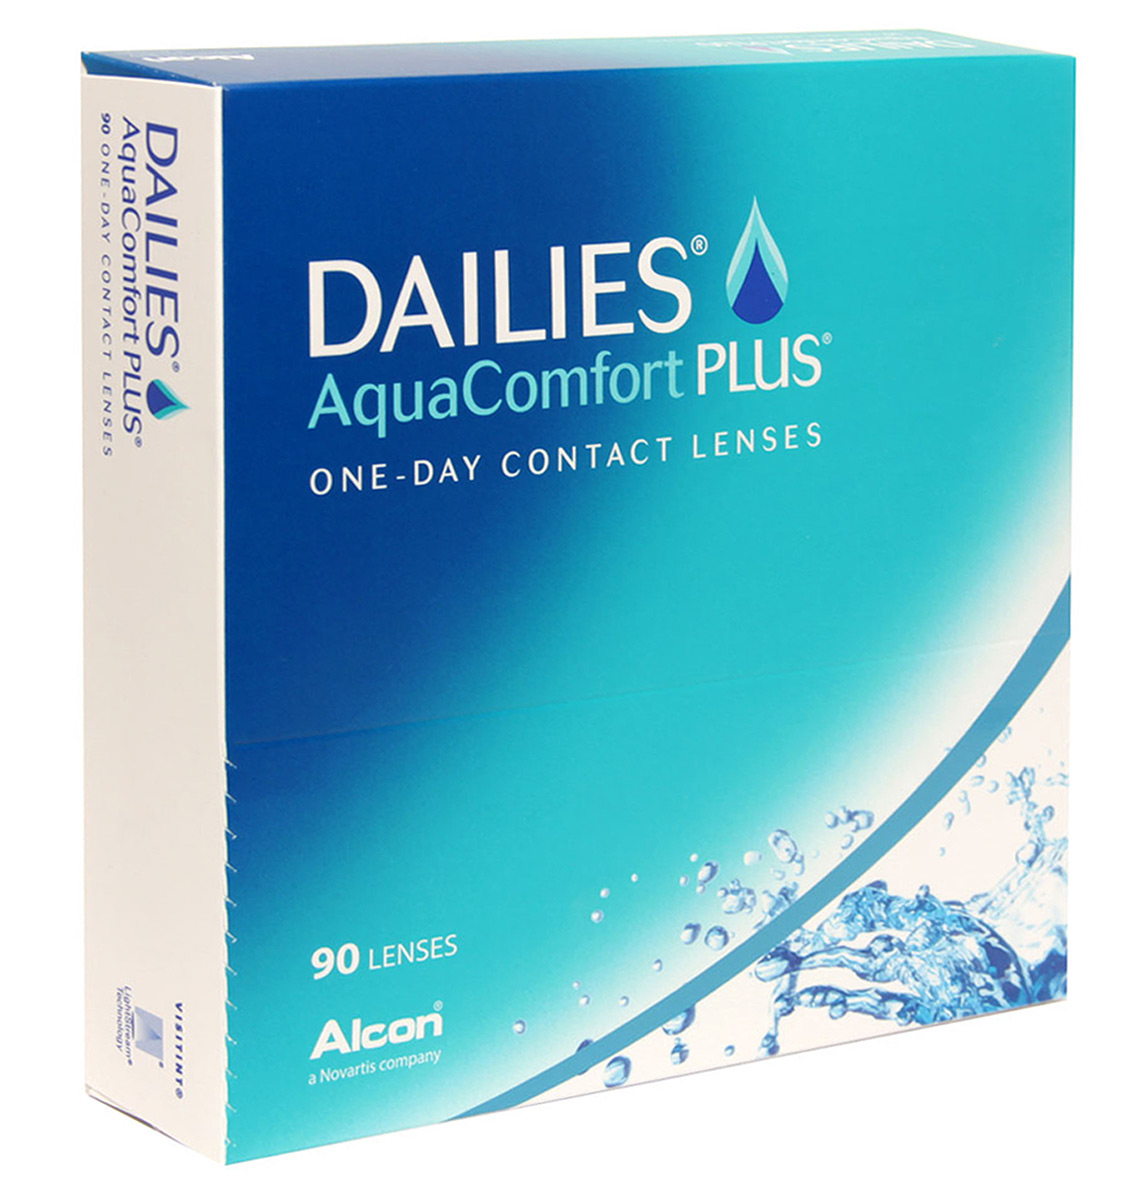 Alcon-CIBA Vision контактные линзы Dailies AquaComfort Plus (90шт / 8.7 / 14.0 / -3.00)